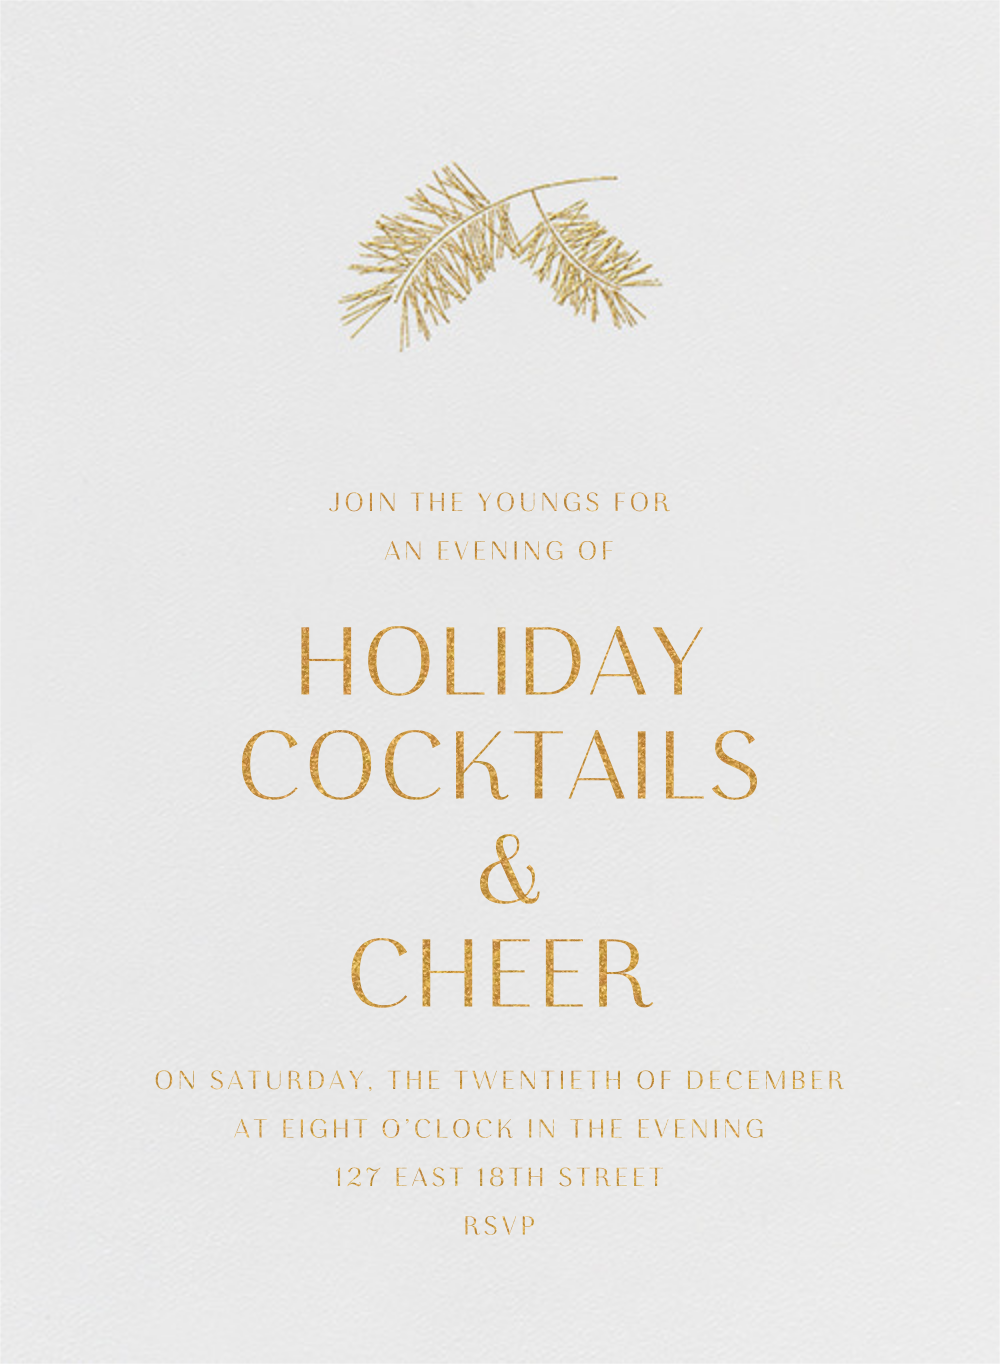 Caledonia (Invitation) - Paperless Post - Company holiday party